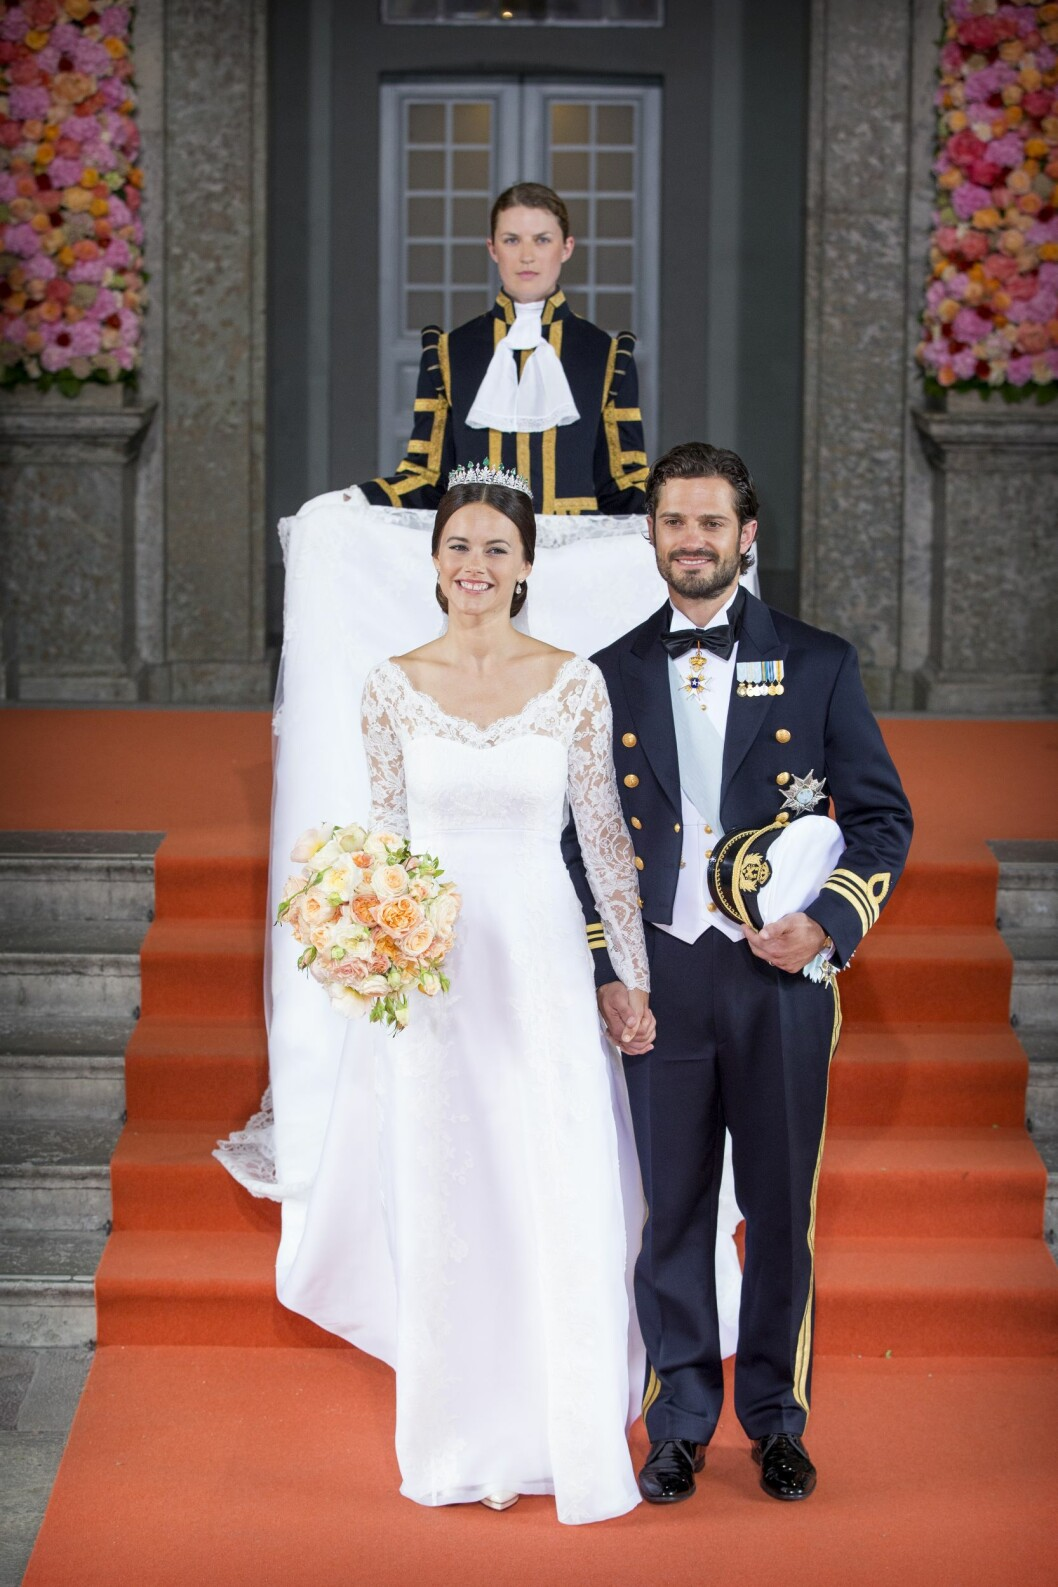 GIFTET SEG: Prins Carl Philip og hans Sofia giftet seg 13 juni i fjor.  Foto: DPA